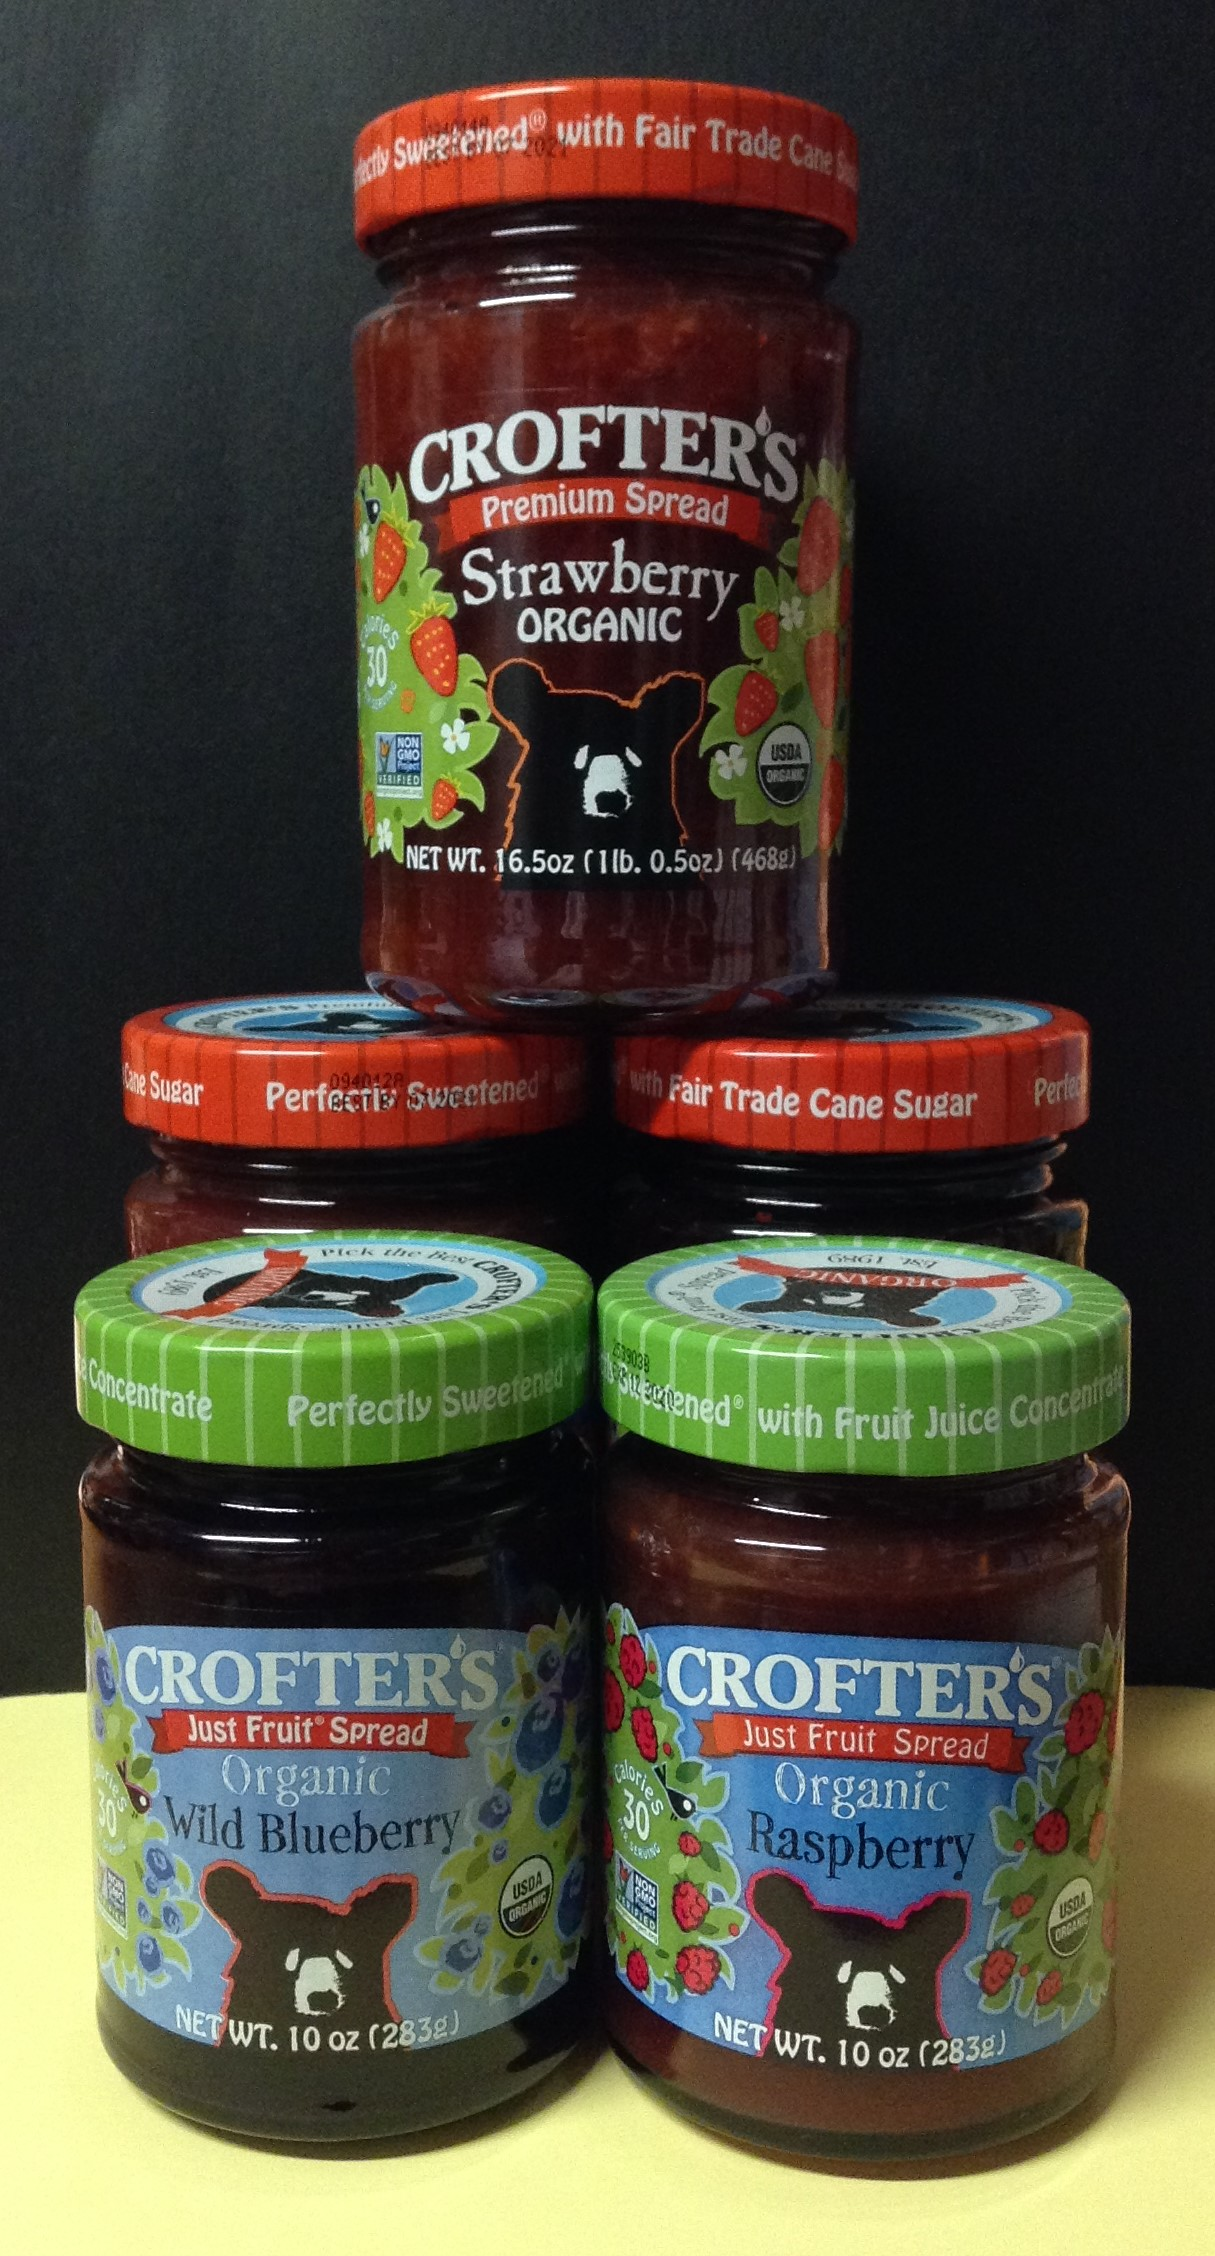 CROFTER'S Organic Premium Fruit Spreads